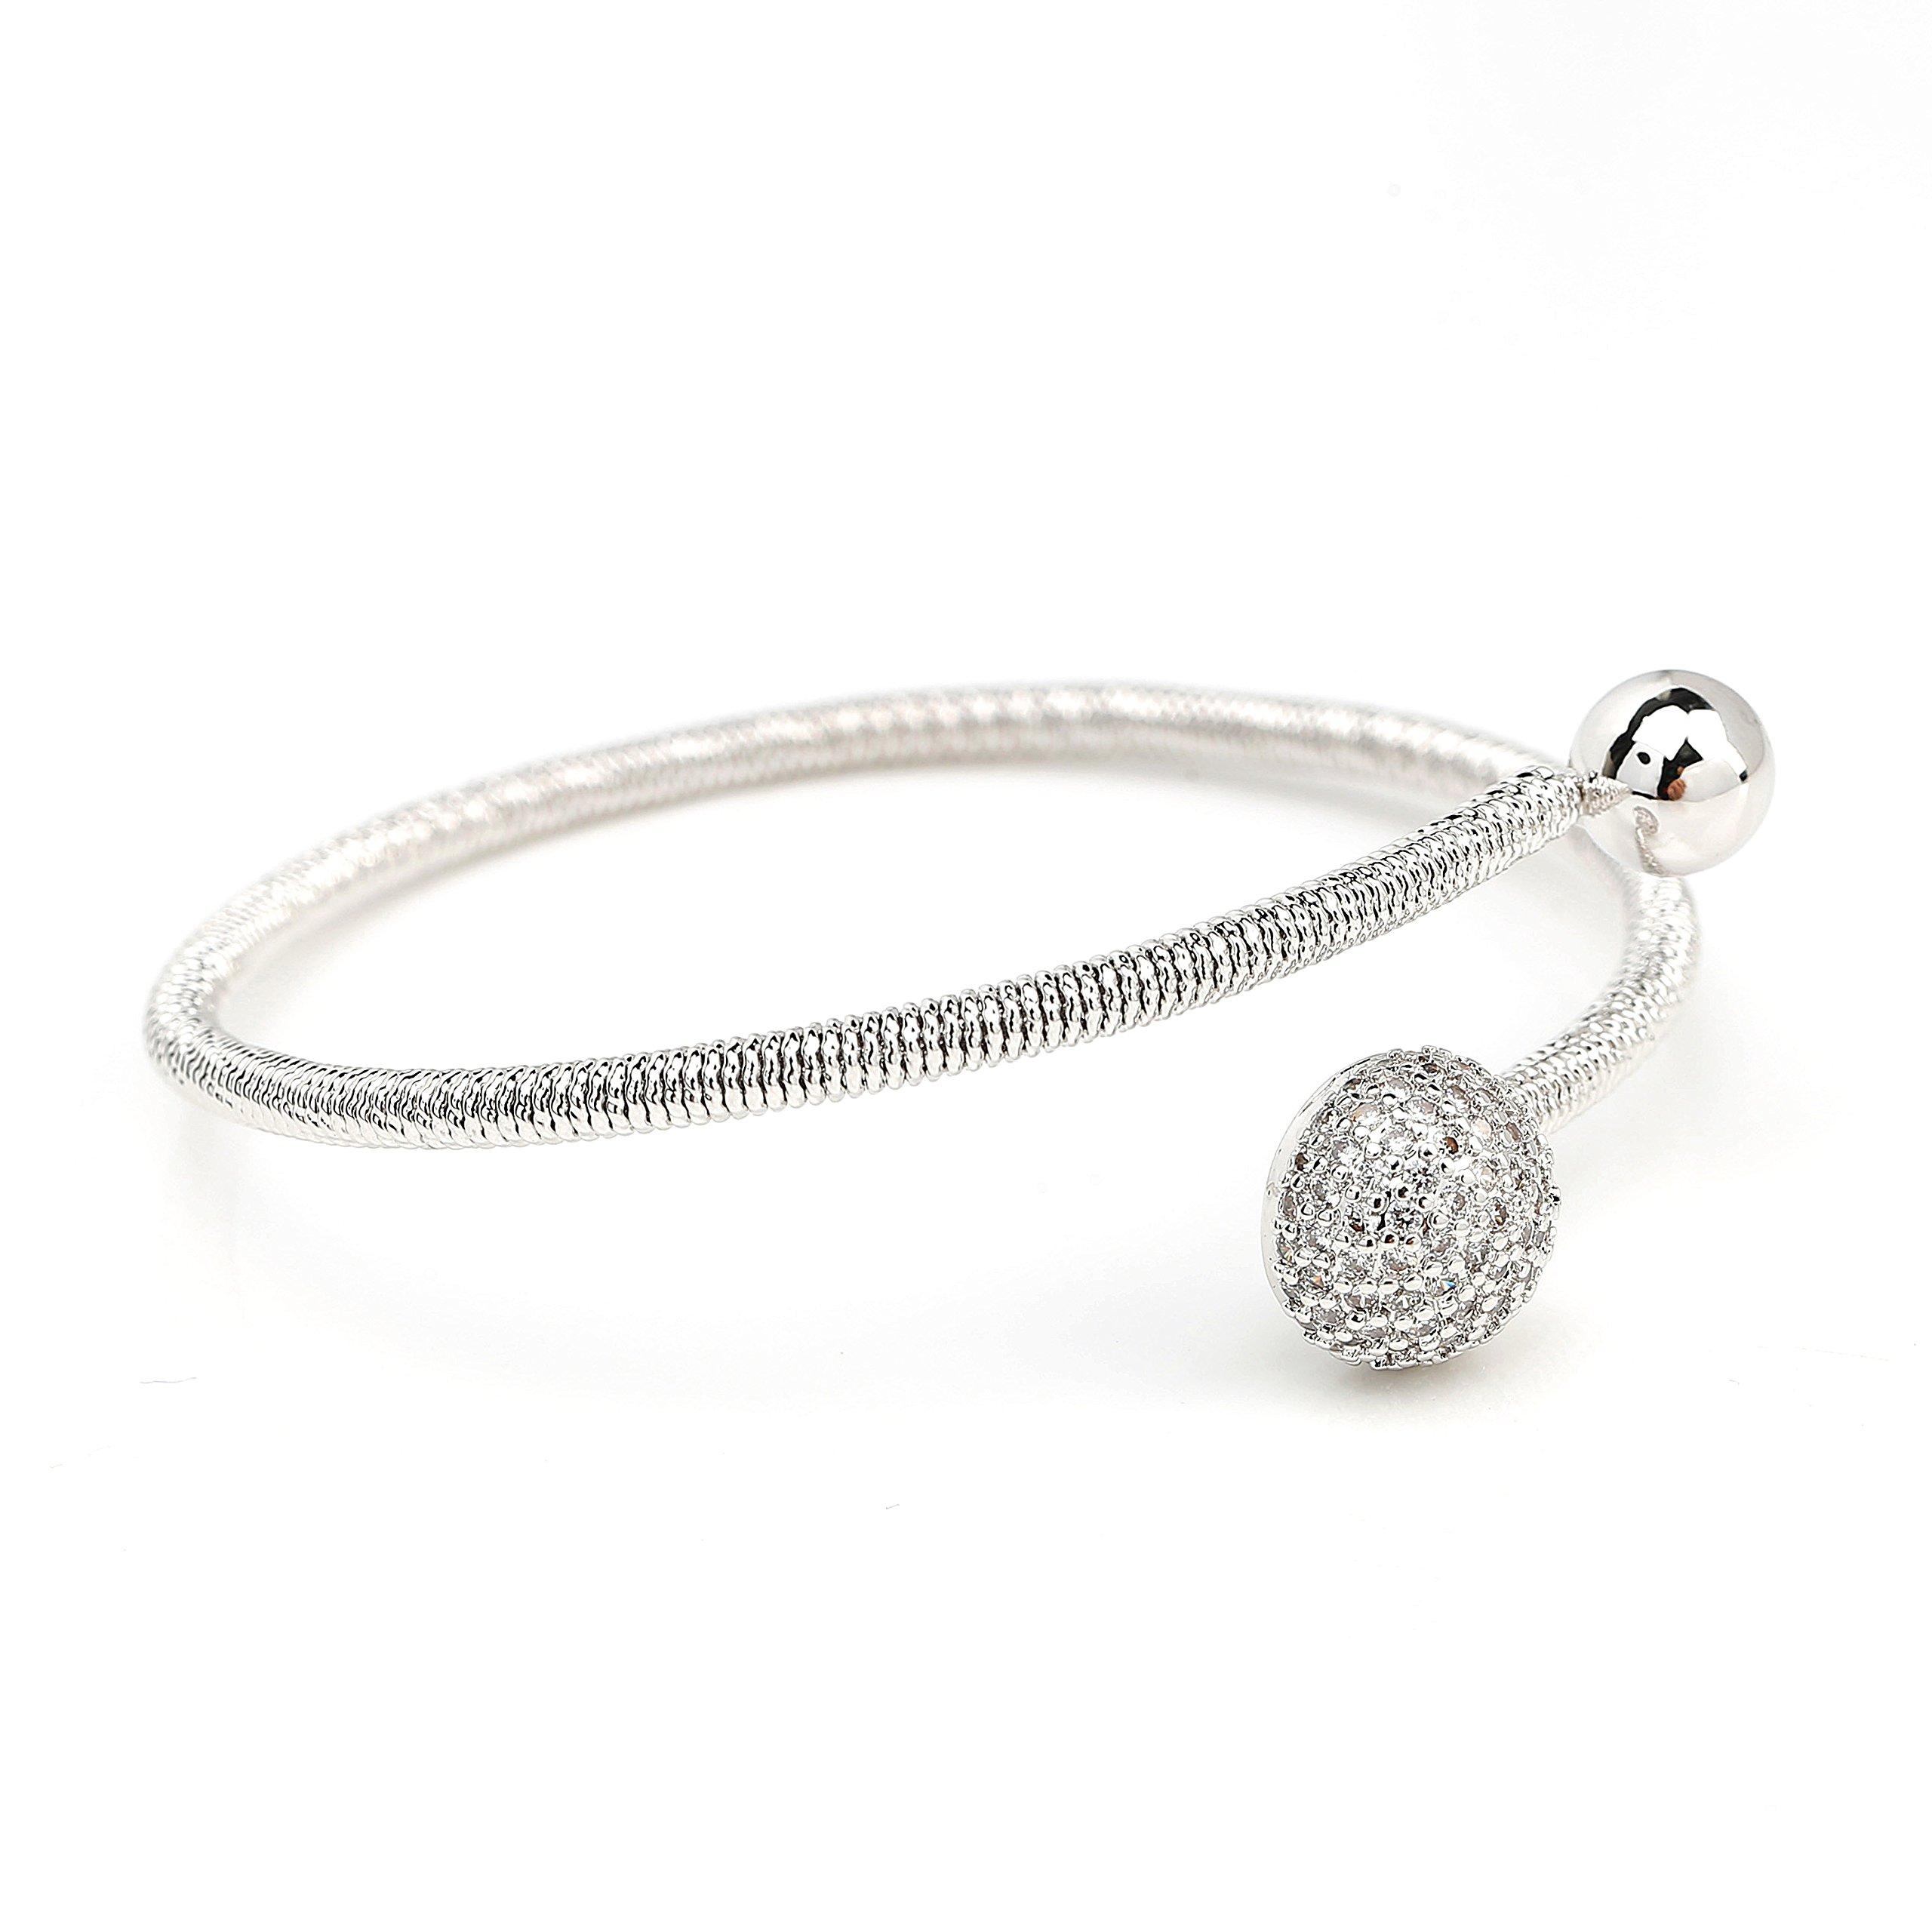 Stylish Designer Wrap Bangle Bracelet with Sparkling Swarovski Style Crystals